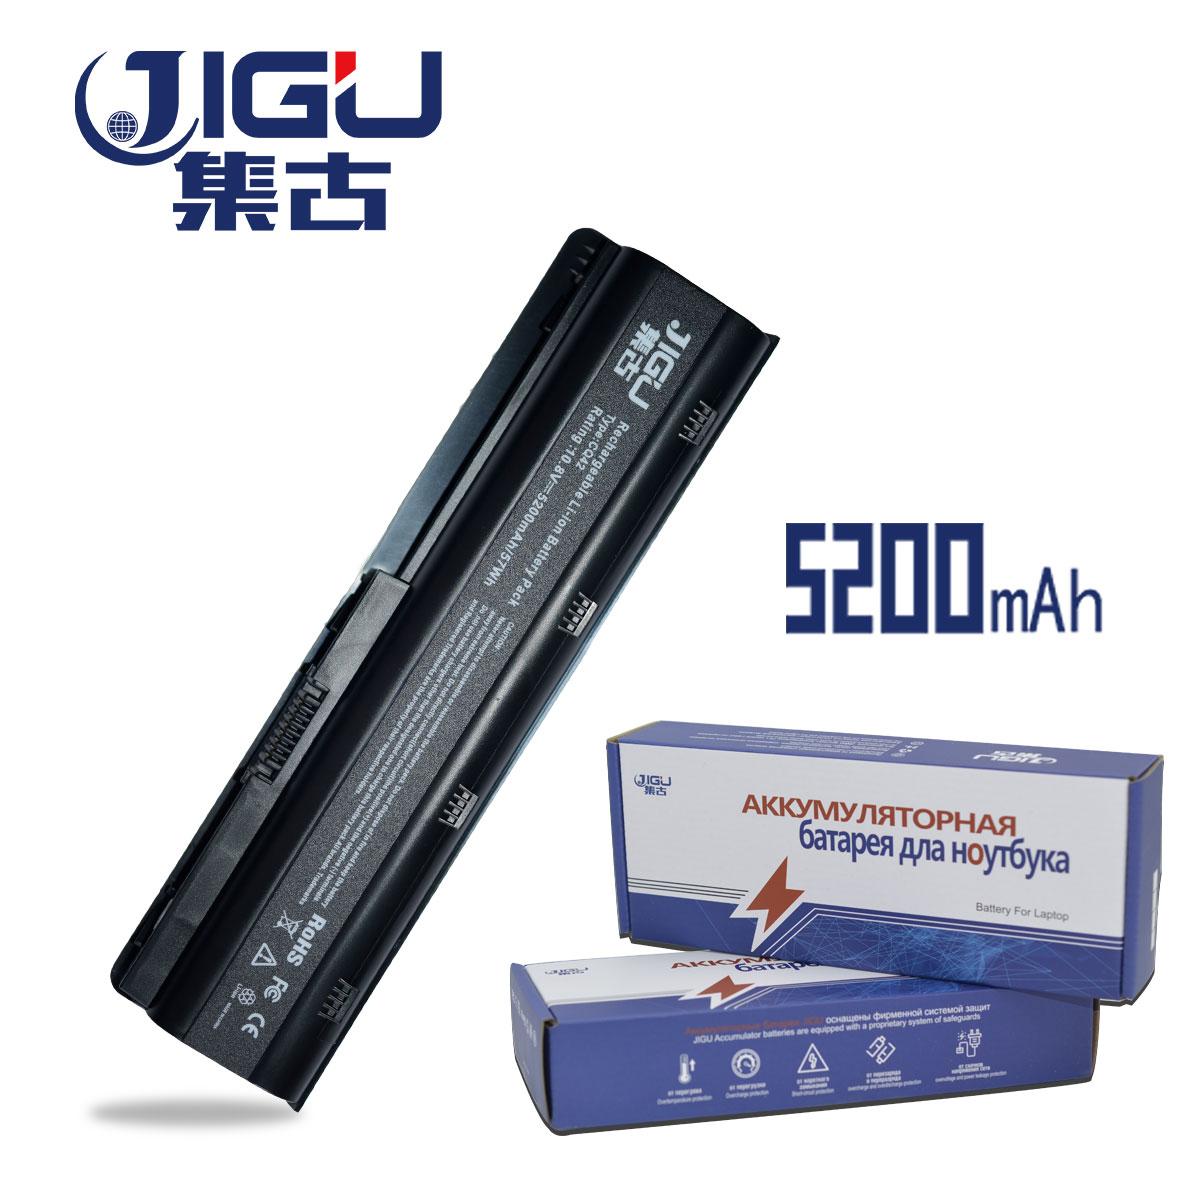 JIGU Laptop Battery 586007-541 593553-001 593554-001 593562-001 HSTNN-UB0W WD548AA For HP Compaq Presario CQ32 CQ42-100 CQ42-200 iecwanx 100% new laptop battery fmvnbp225 7 2v 36wh 5000mah for fujitsu stylistic q572 w7d 001 q572 w8 001 q572 g q572